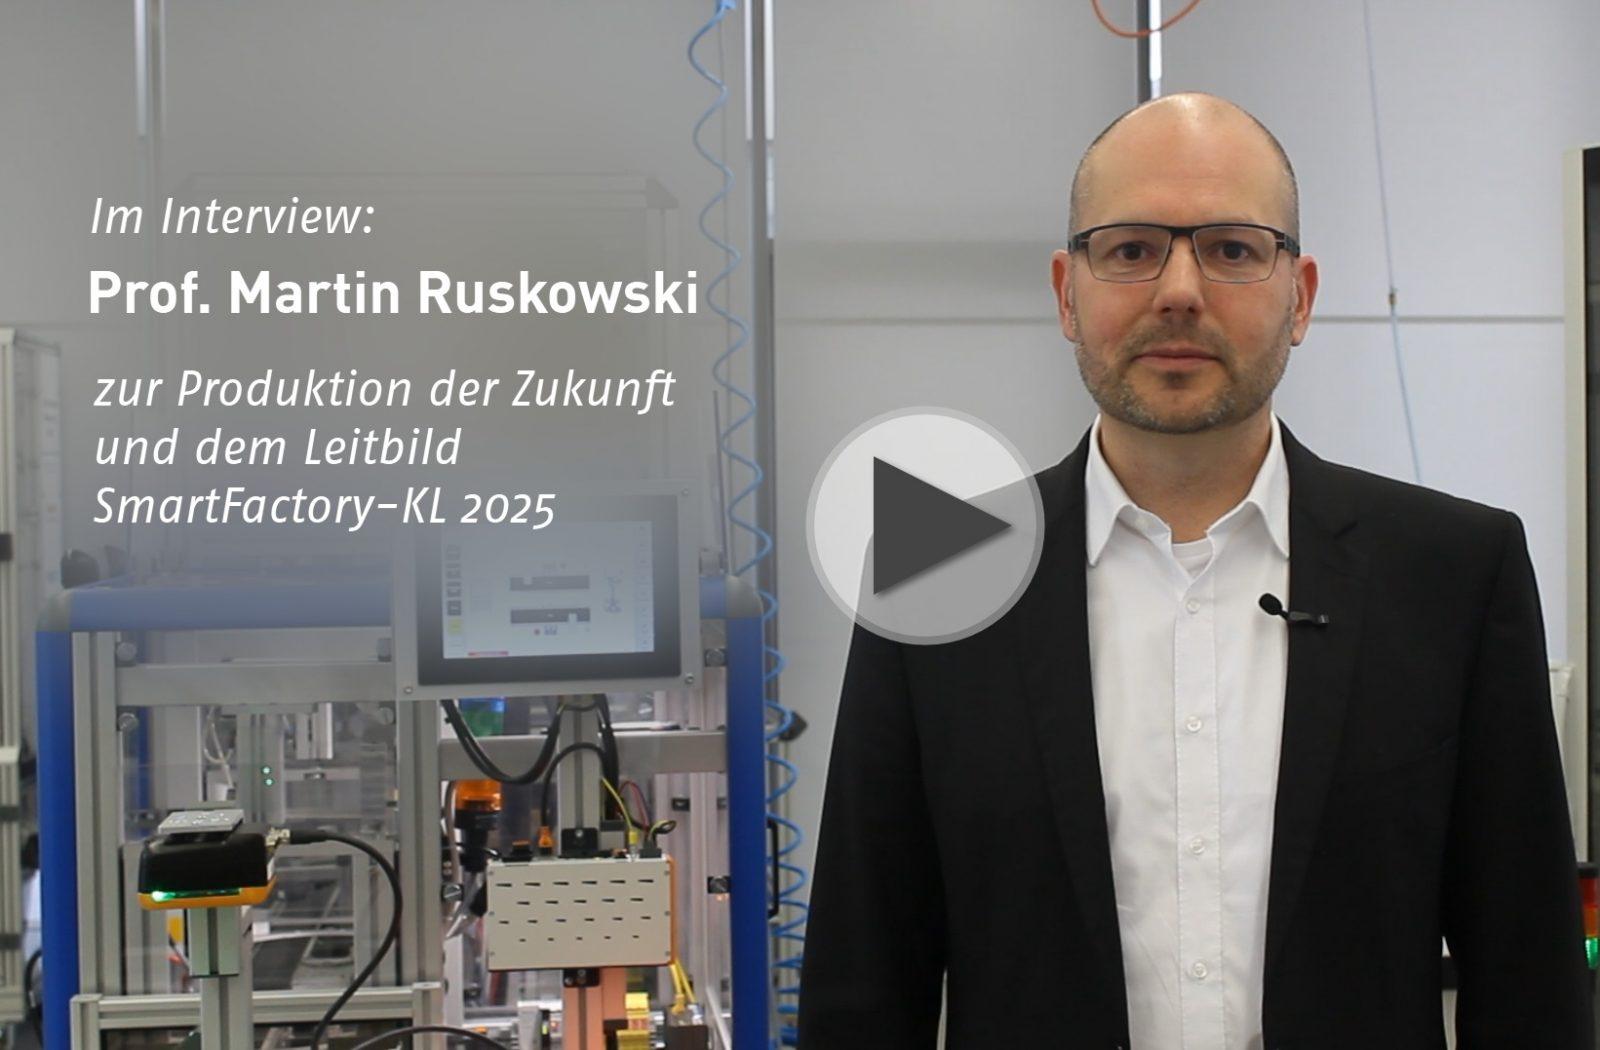 Interview: Prof. Ruskowski on autonomous production